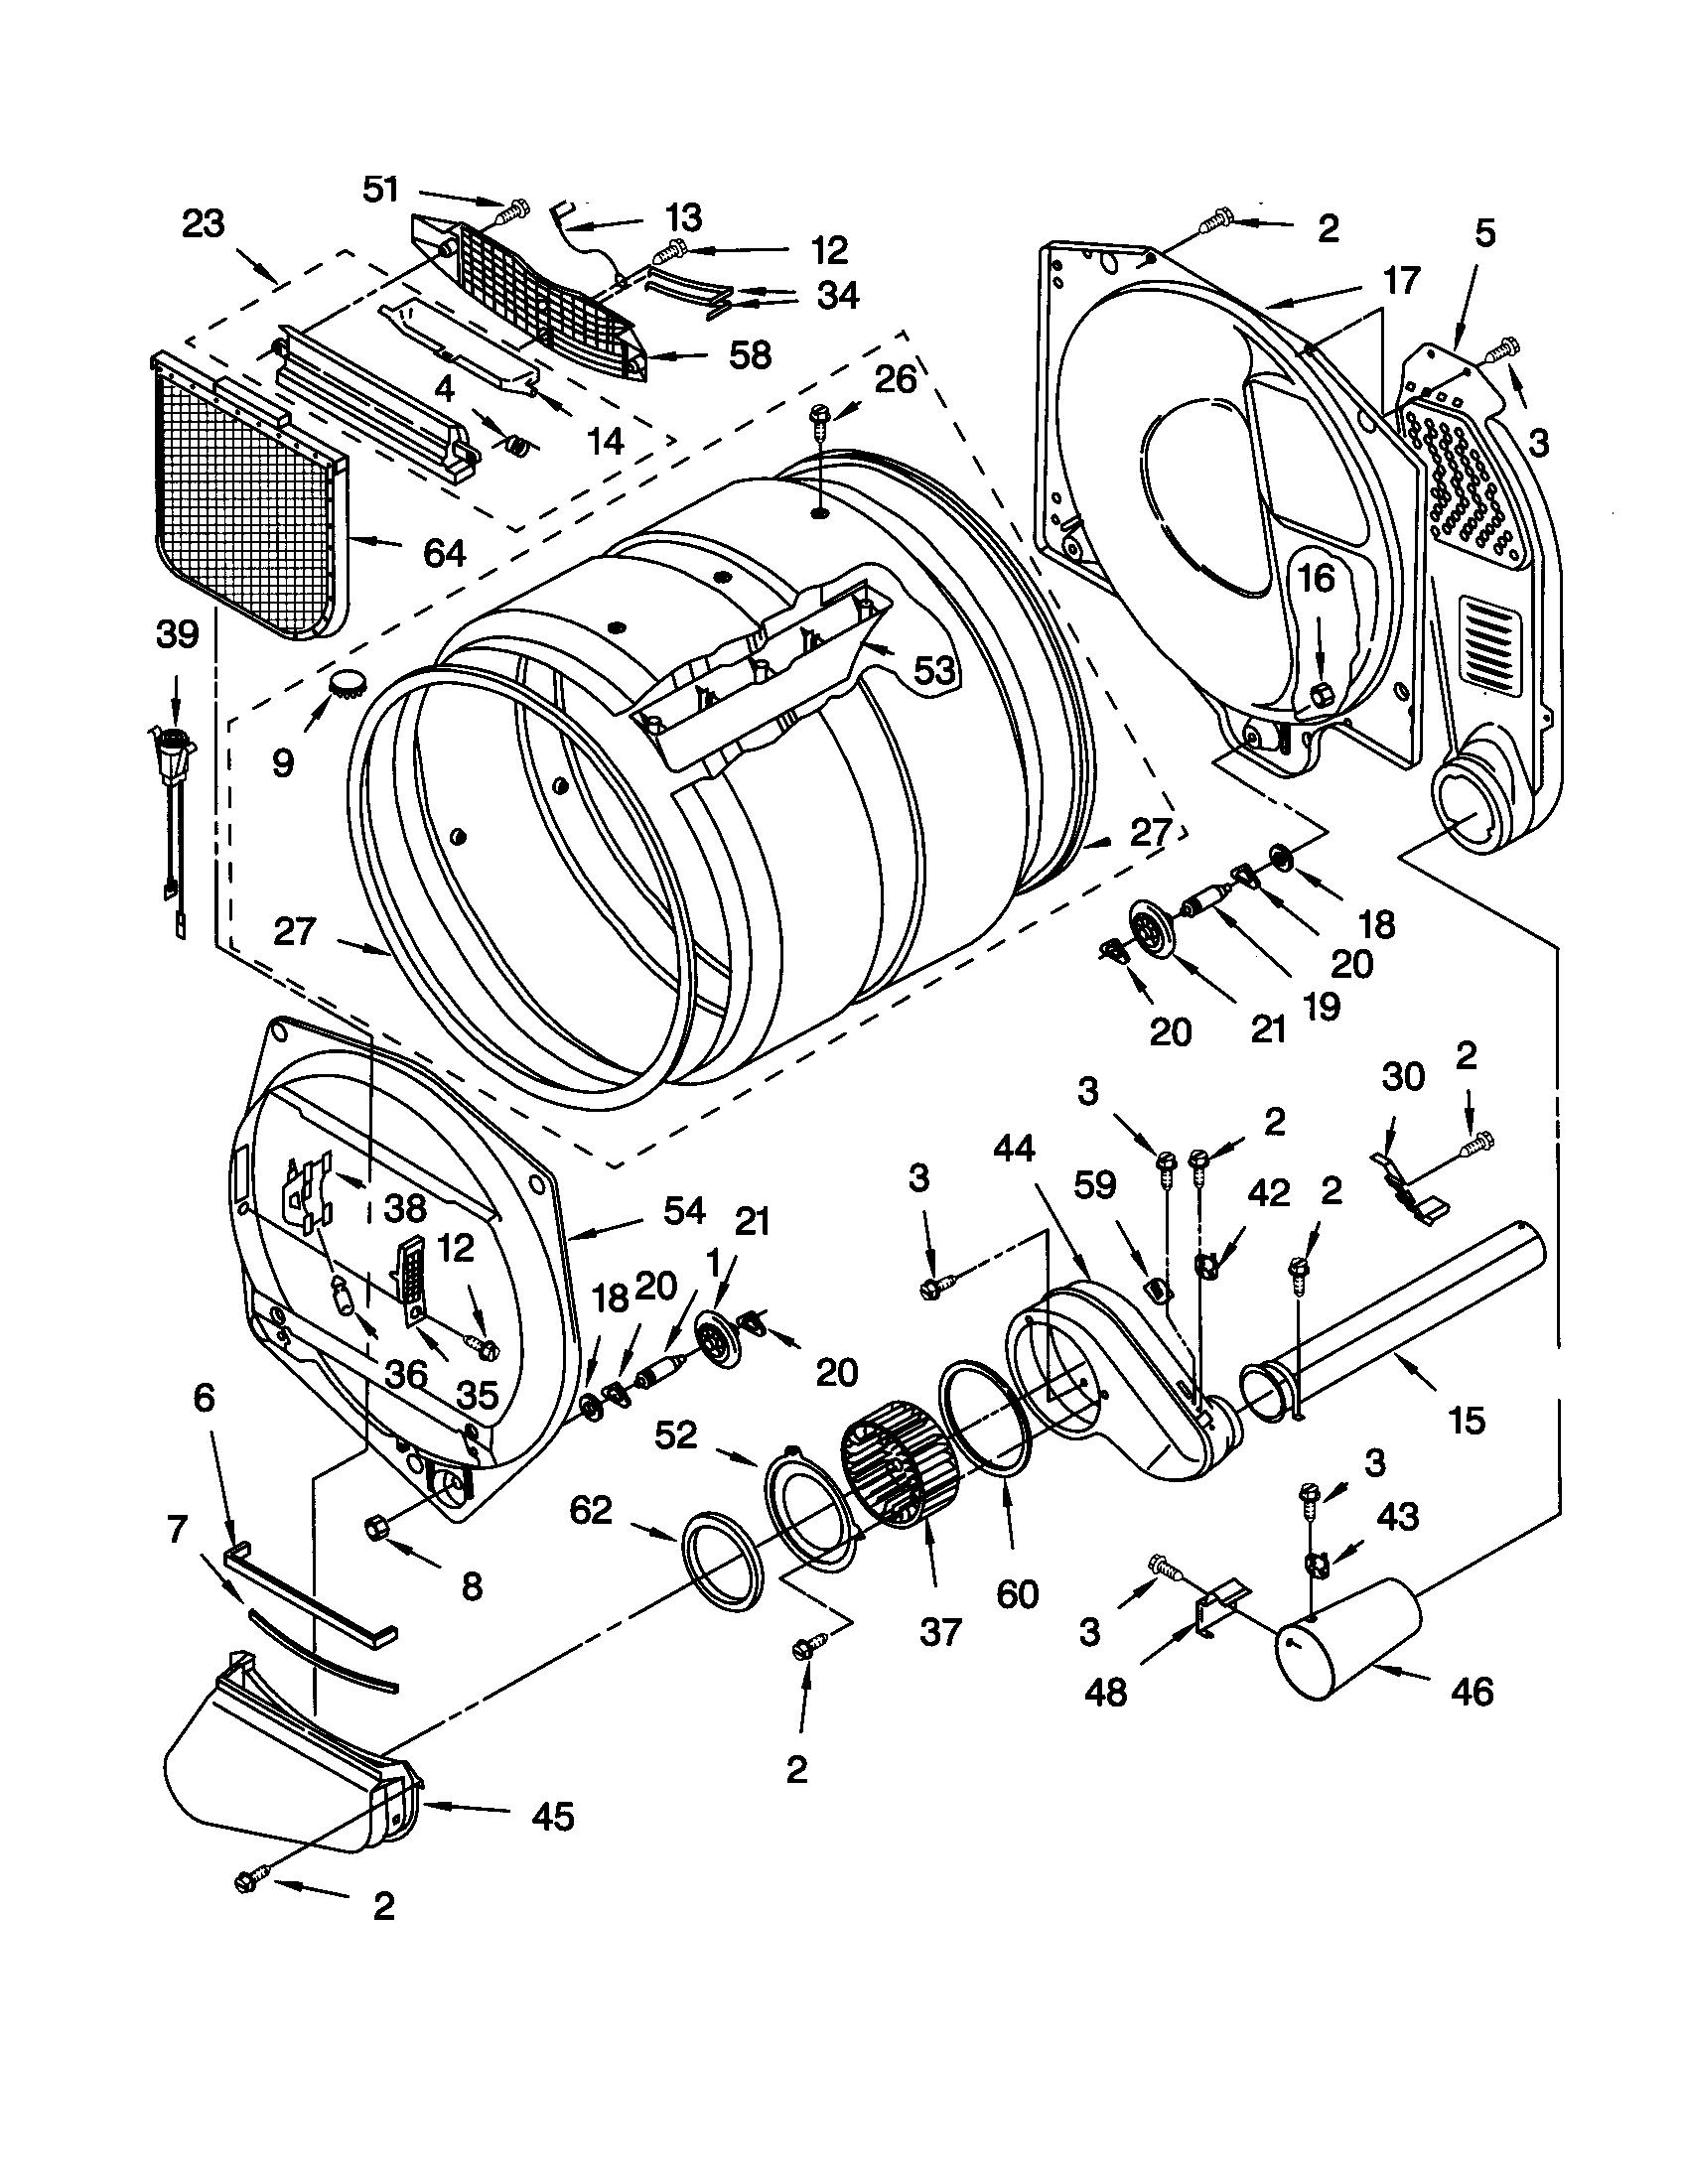 Kenmore model 11070902990 residential dryer genuine parts